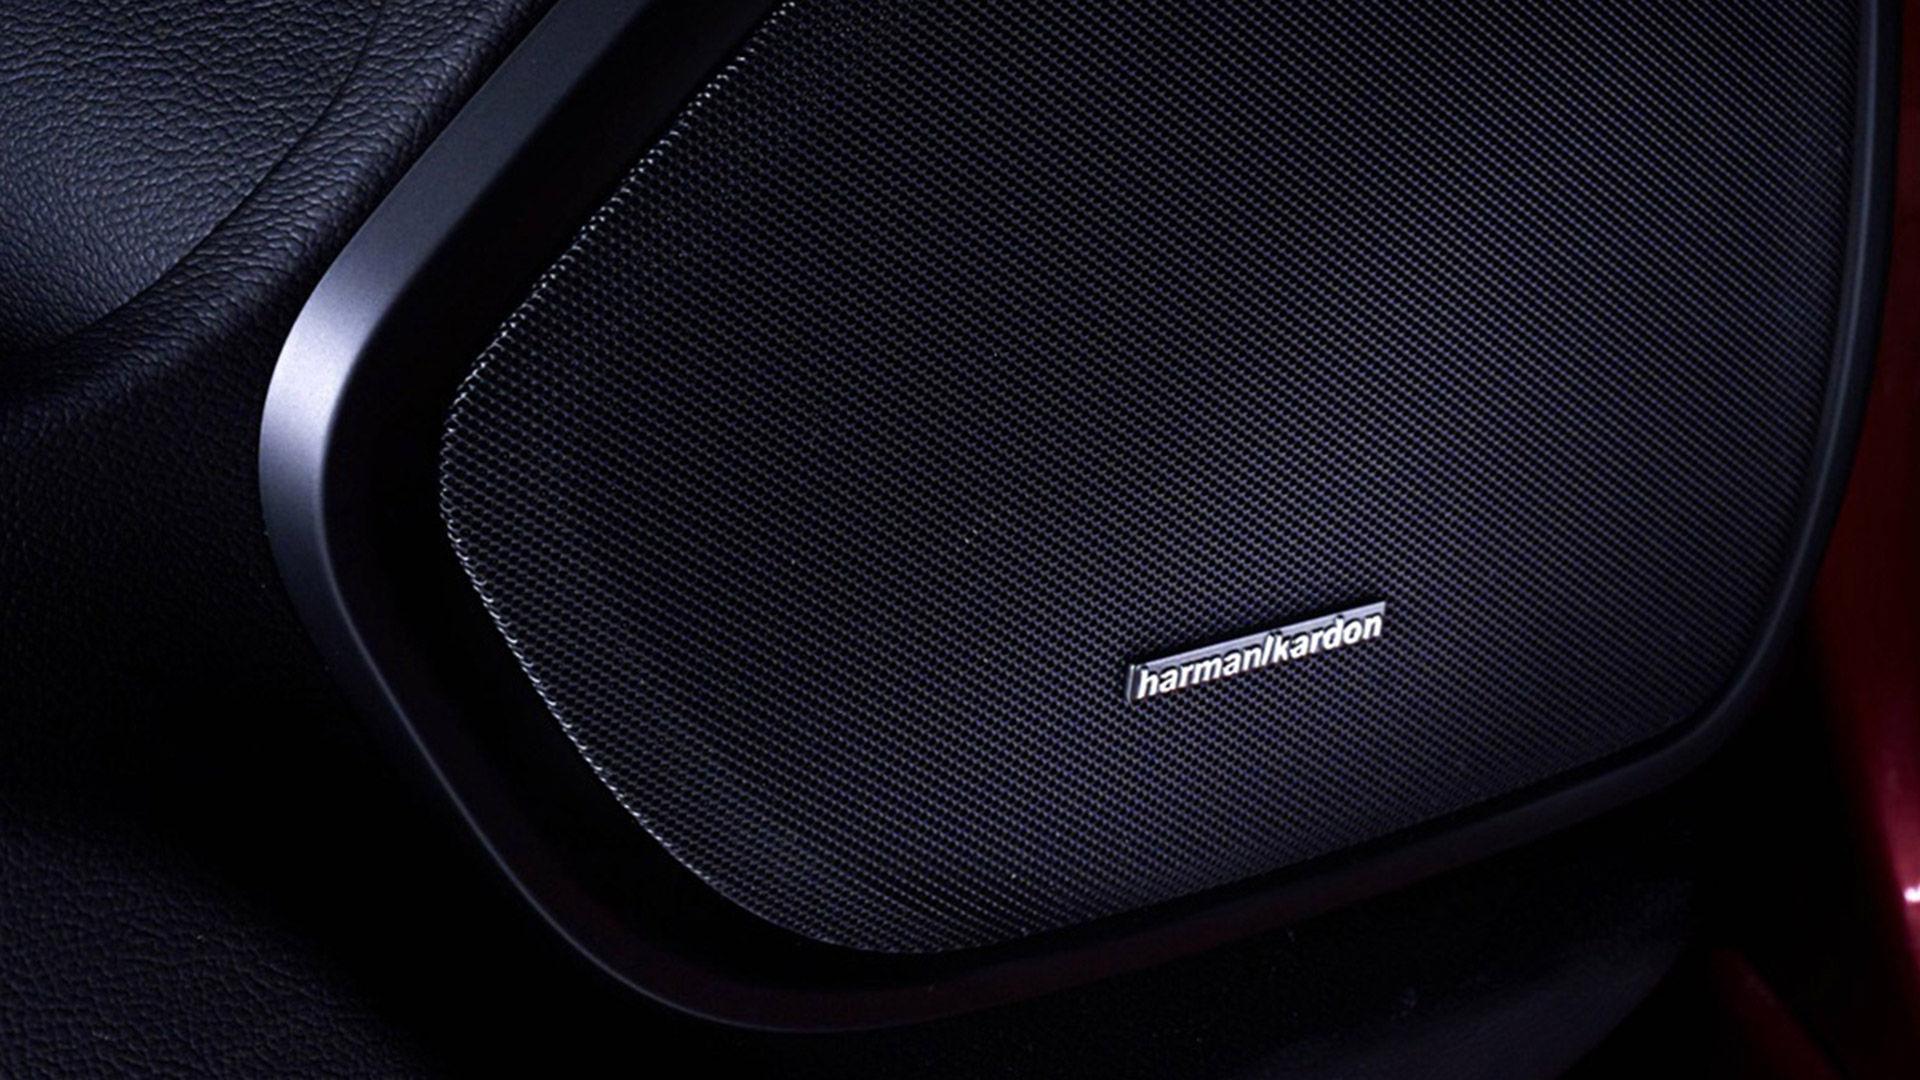 Harman Kardon Lautspreche in Maserati - Detailansicht